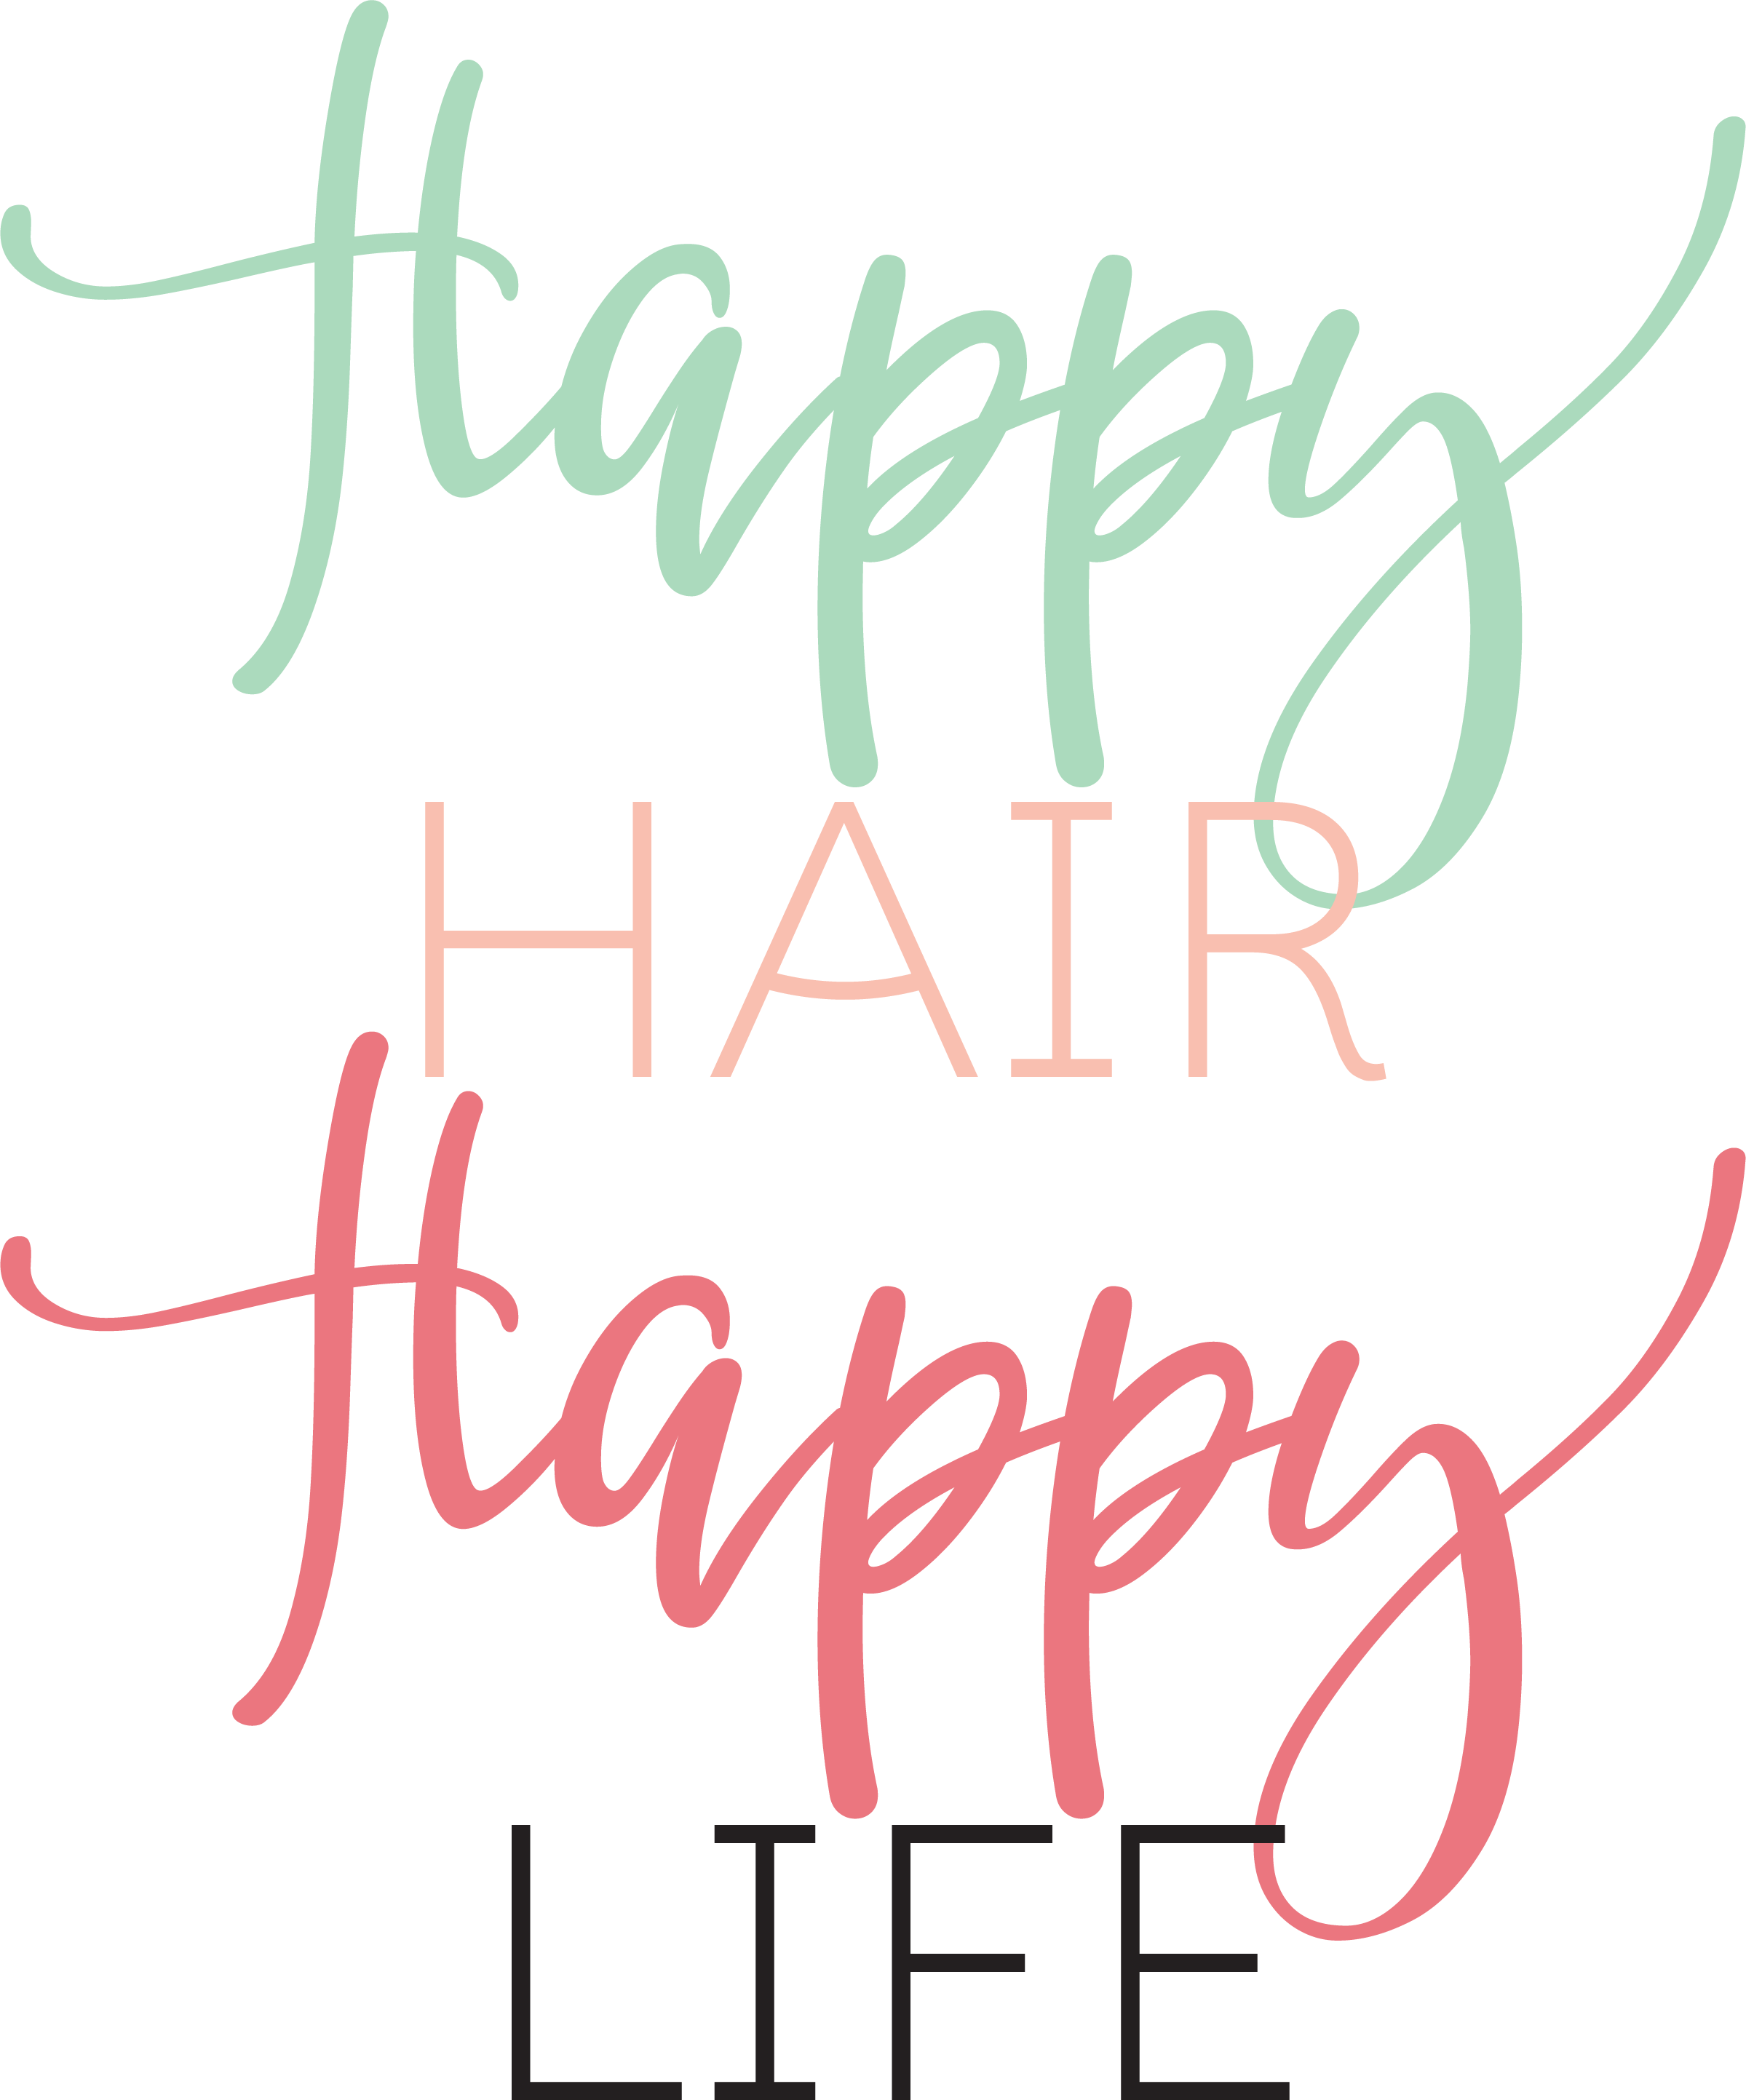 Happy Hair Happy Life SVG Cut File